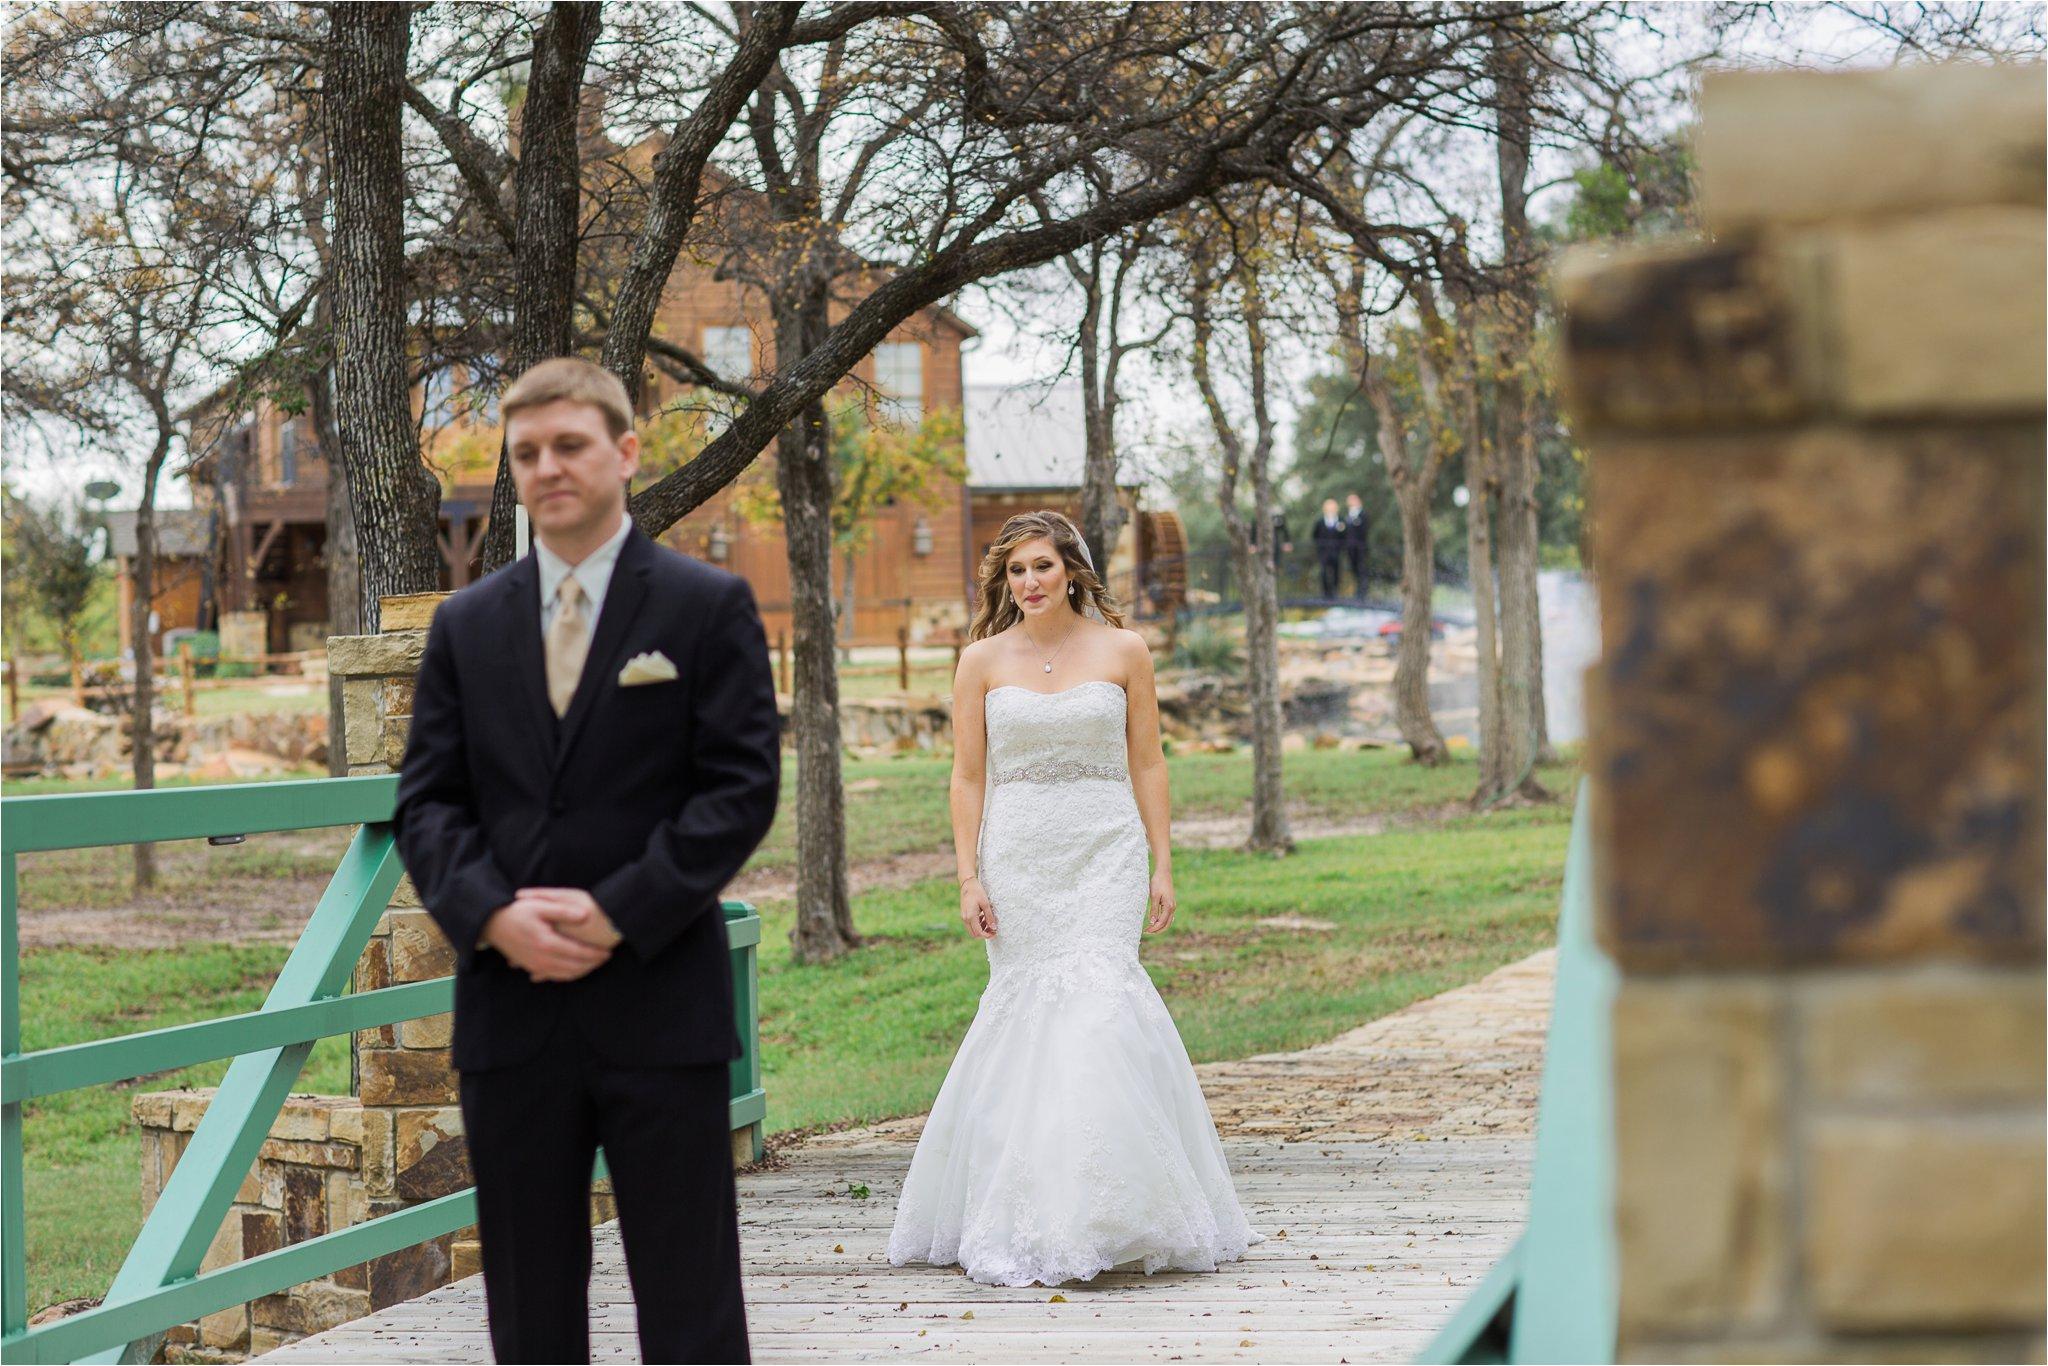 lunsford-wedding-106.jpg